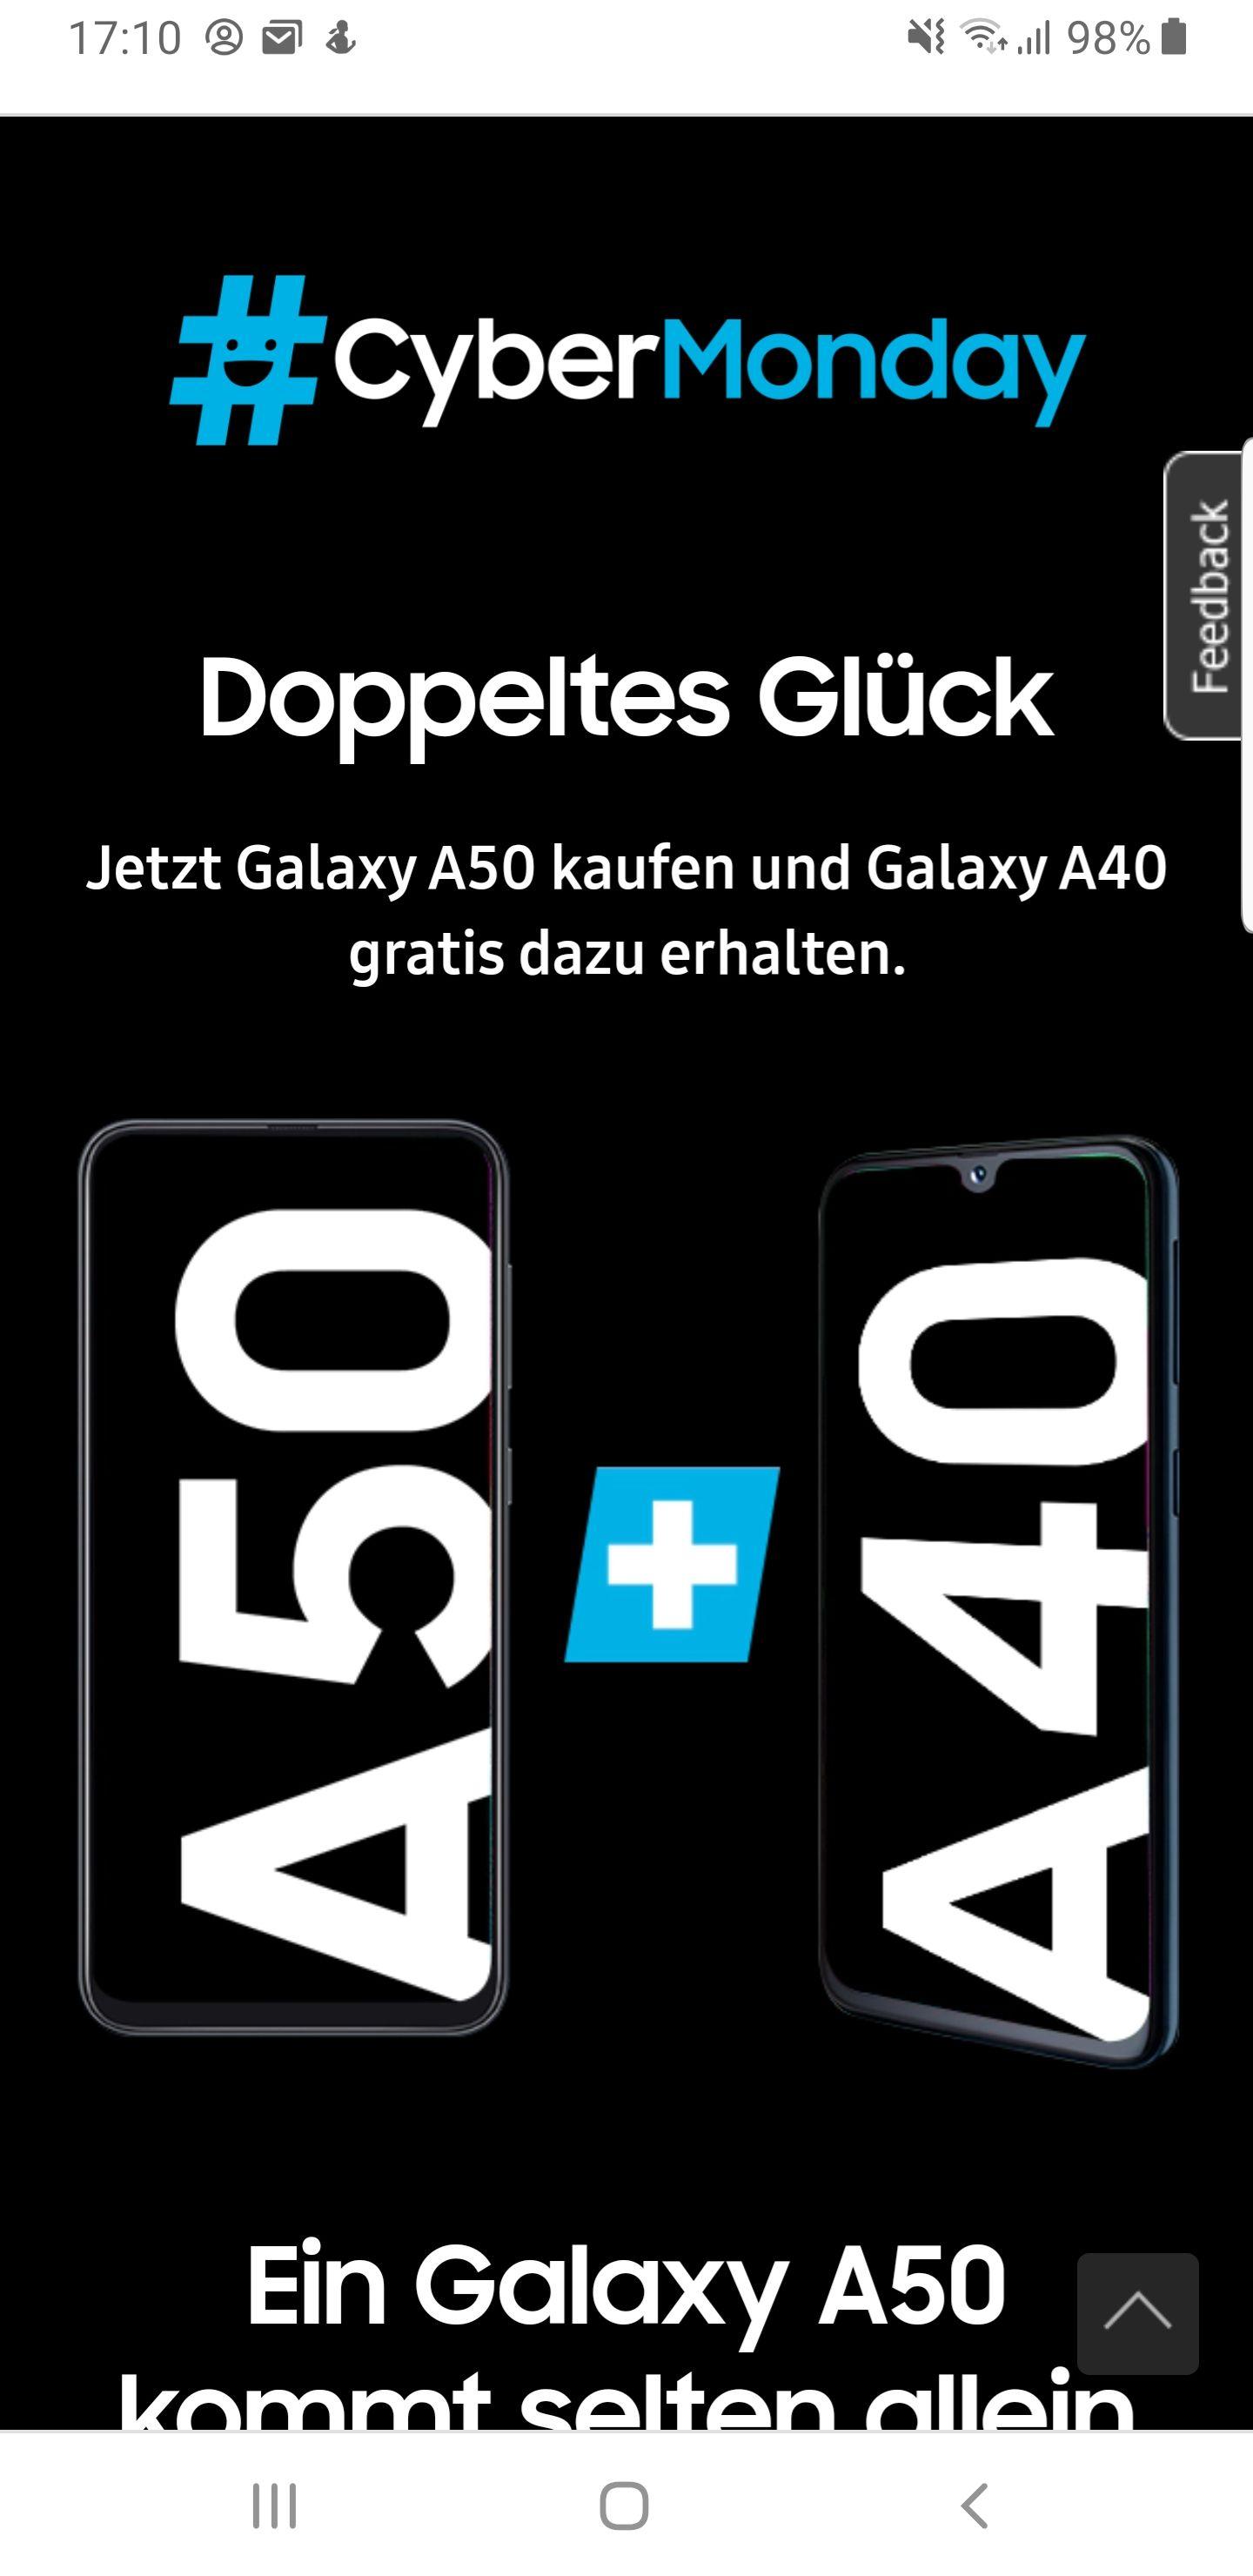 Samsung A50 + A40 für 349€ #Cybermonday Doppeltes Glück